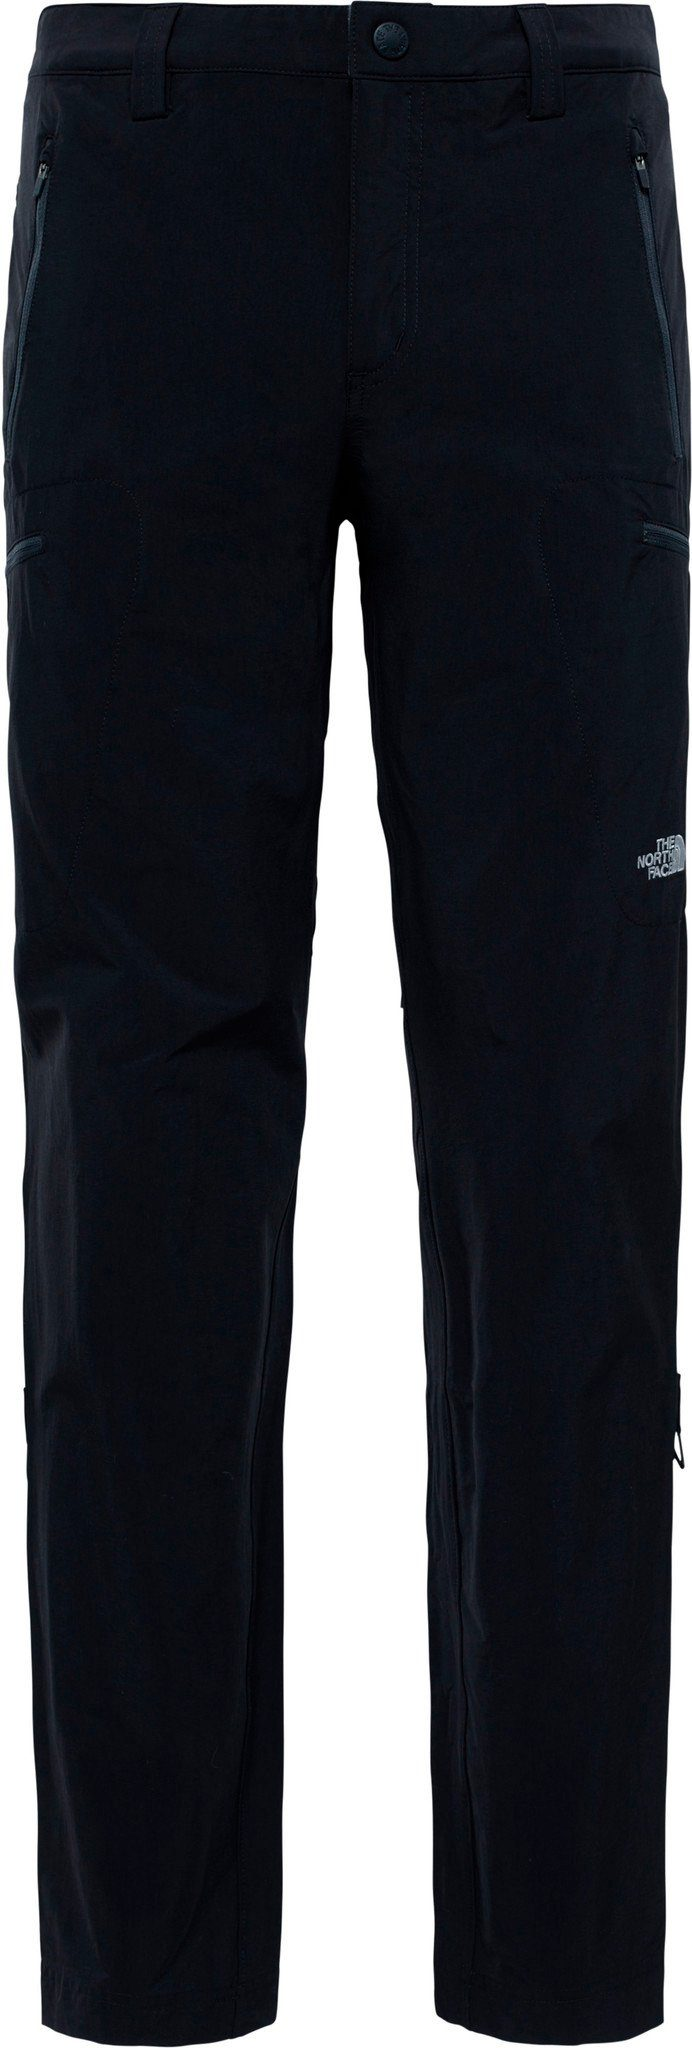 The North Face Outdoorhose »Exploration Pants Men Short«